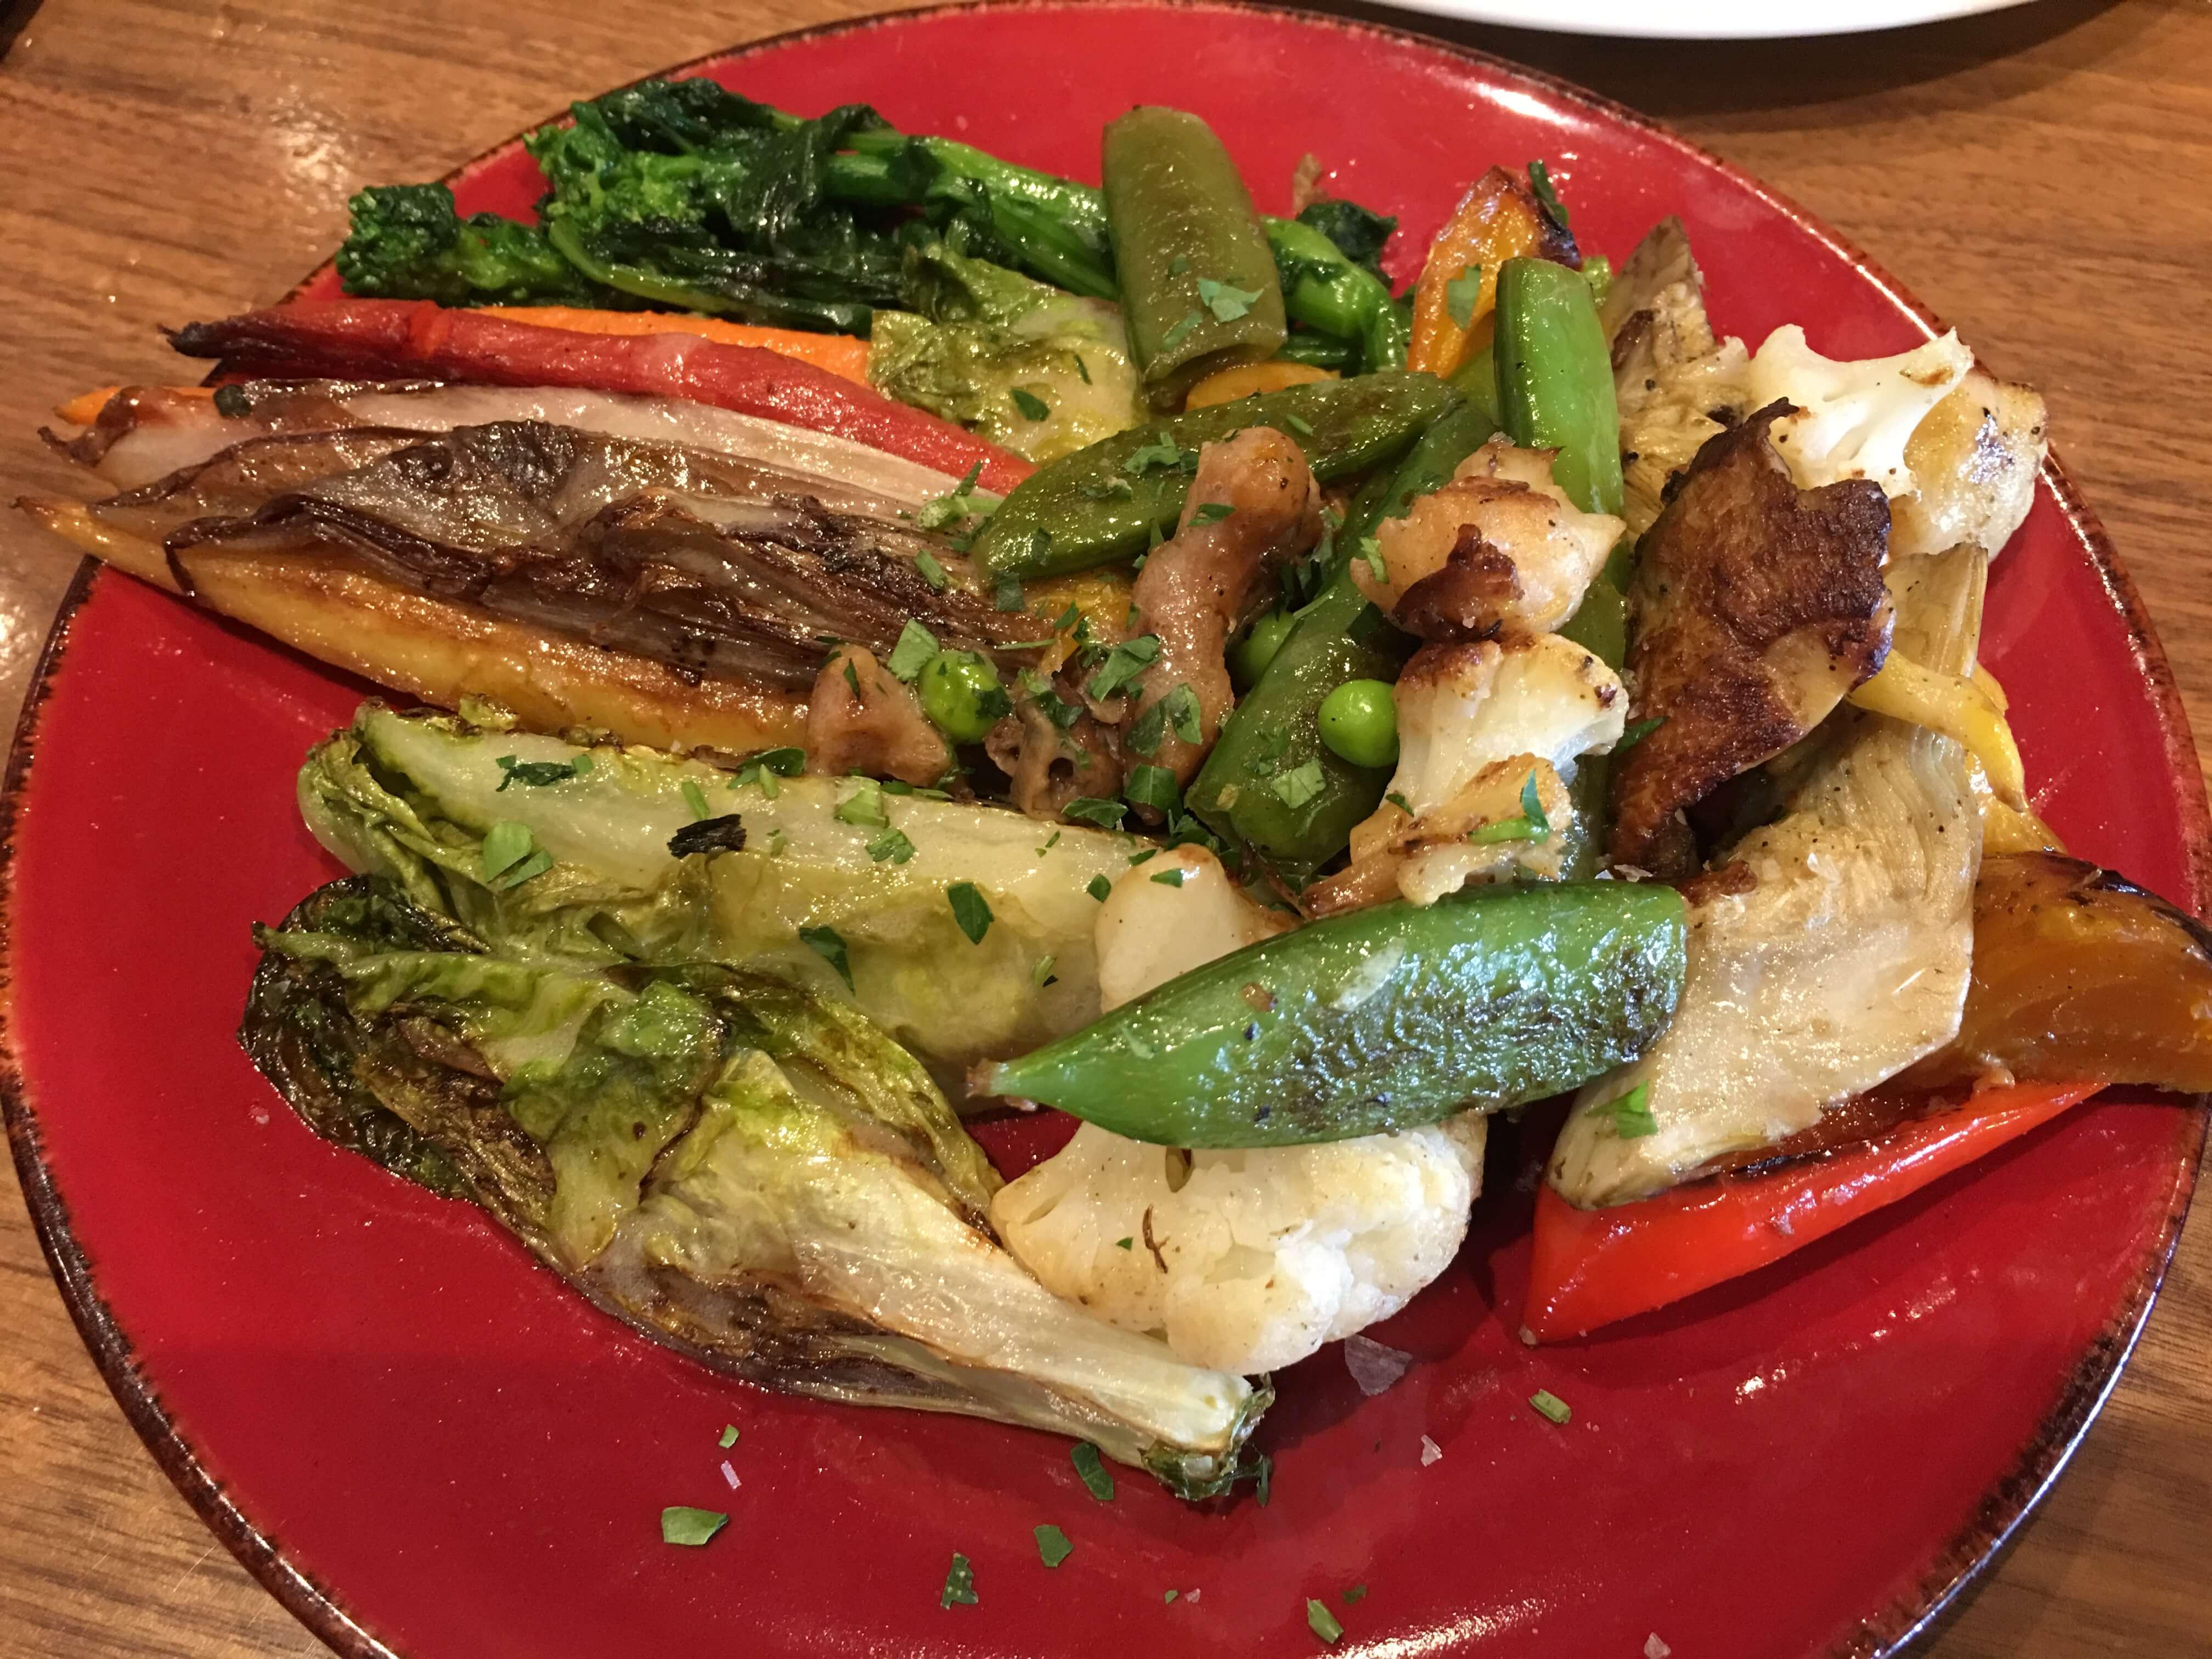 Roasted Seasonal Vegetables. Seared gem lettuce, roasted mixed vegetables.